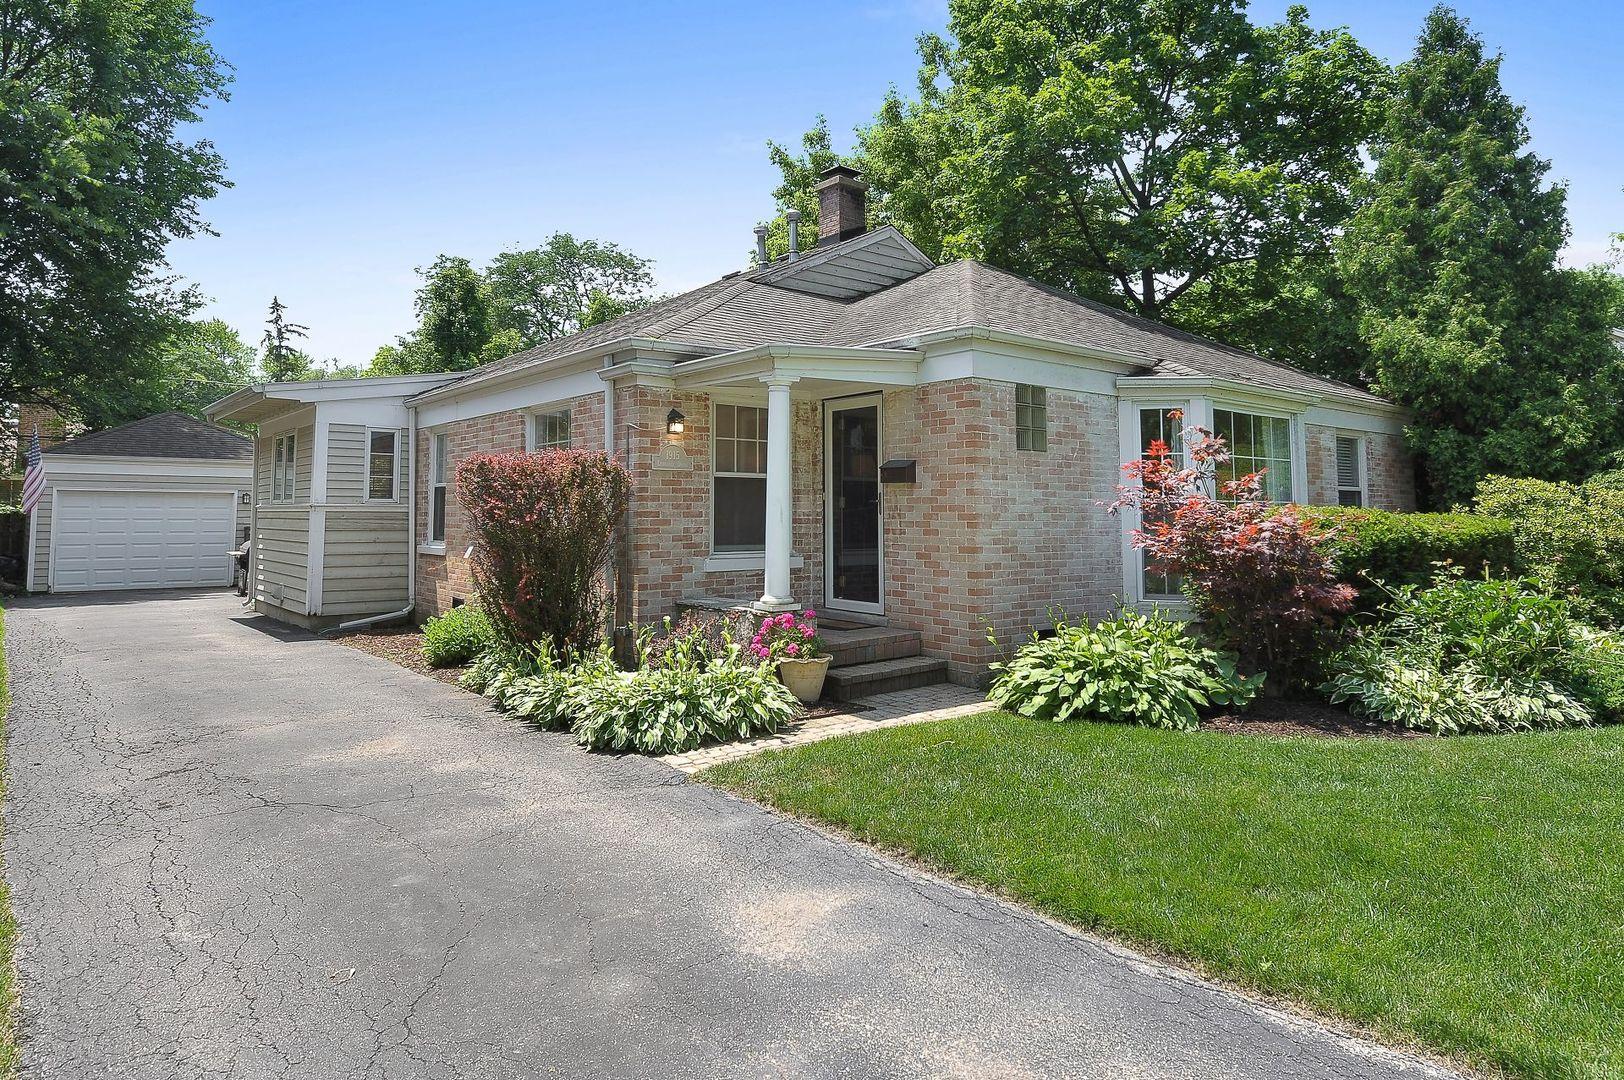 Glenview Real Estate, Glenview Homes, Glenview Investment